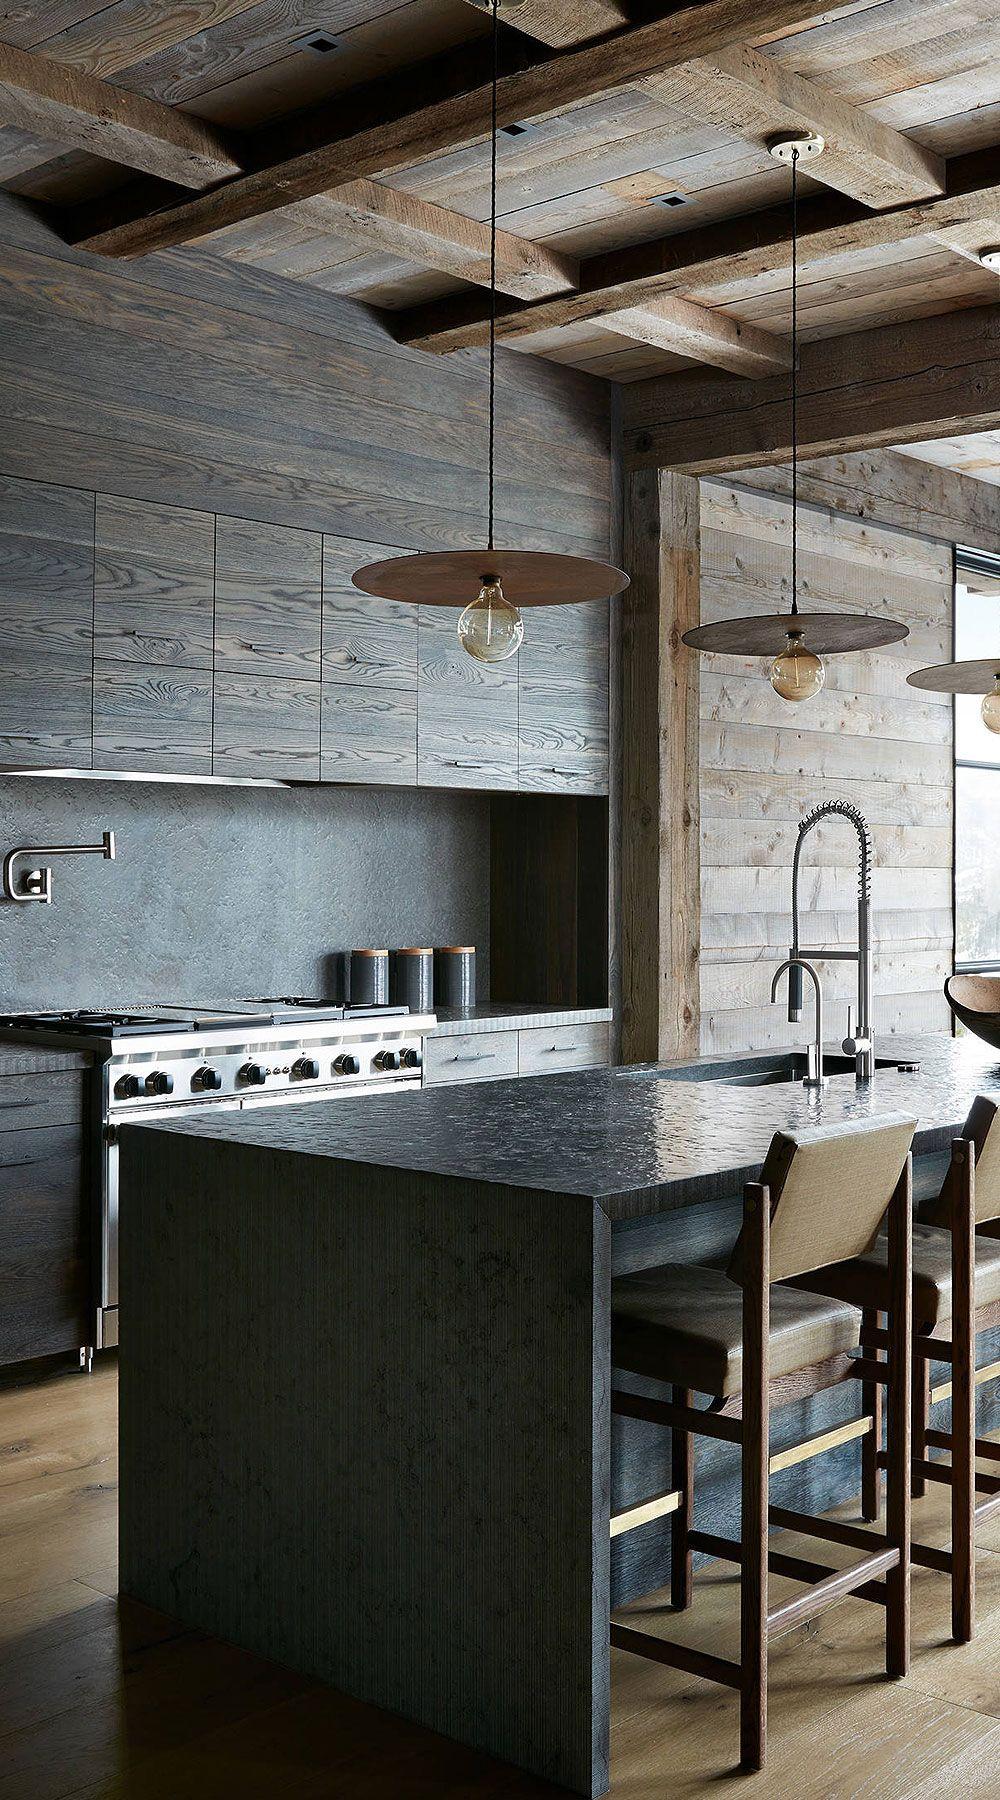 50+ Black Countertop Backsplash Ideas (Tile Designs, Tips ... on Backsplash Ideas With Black Countertops  id=28114